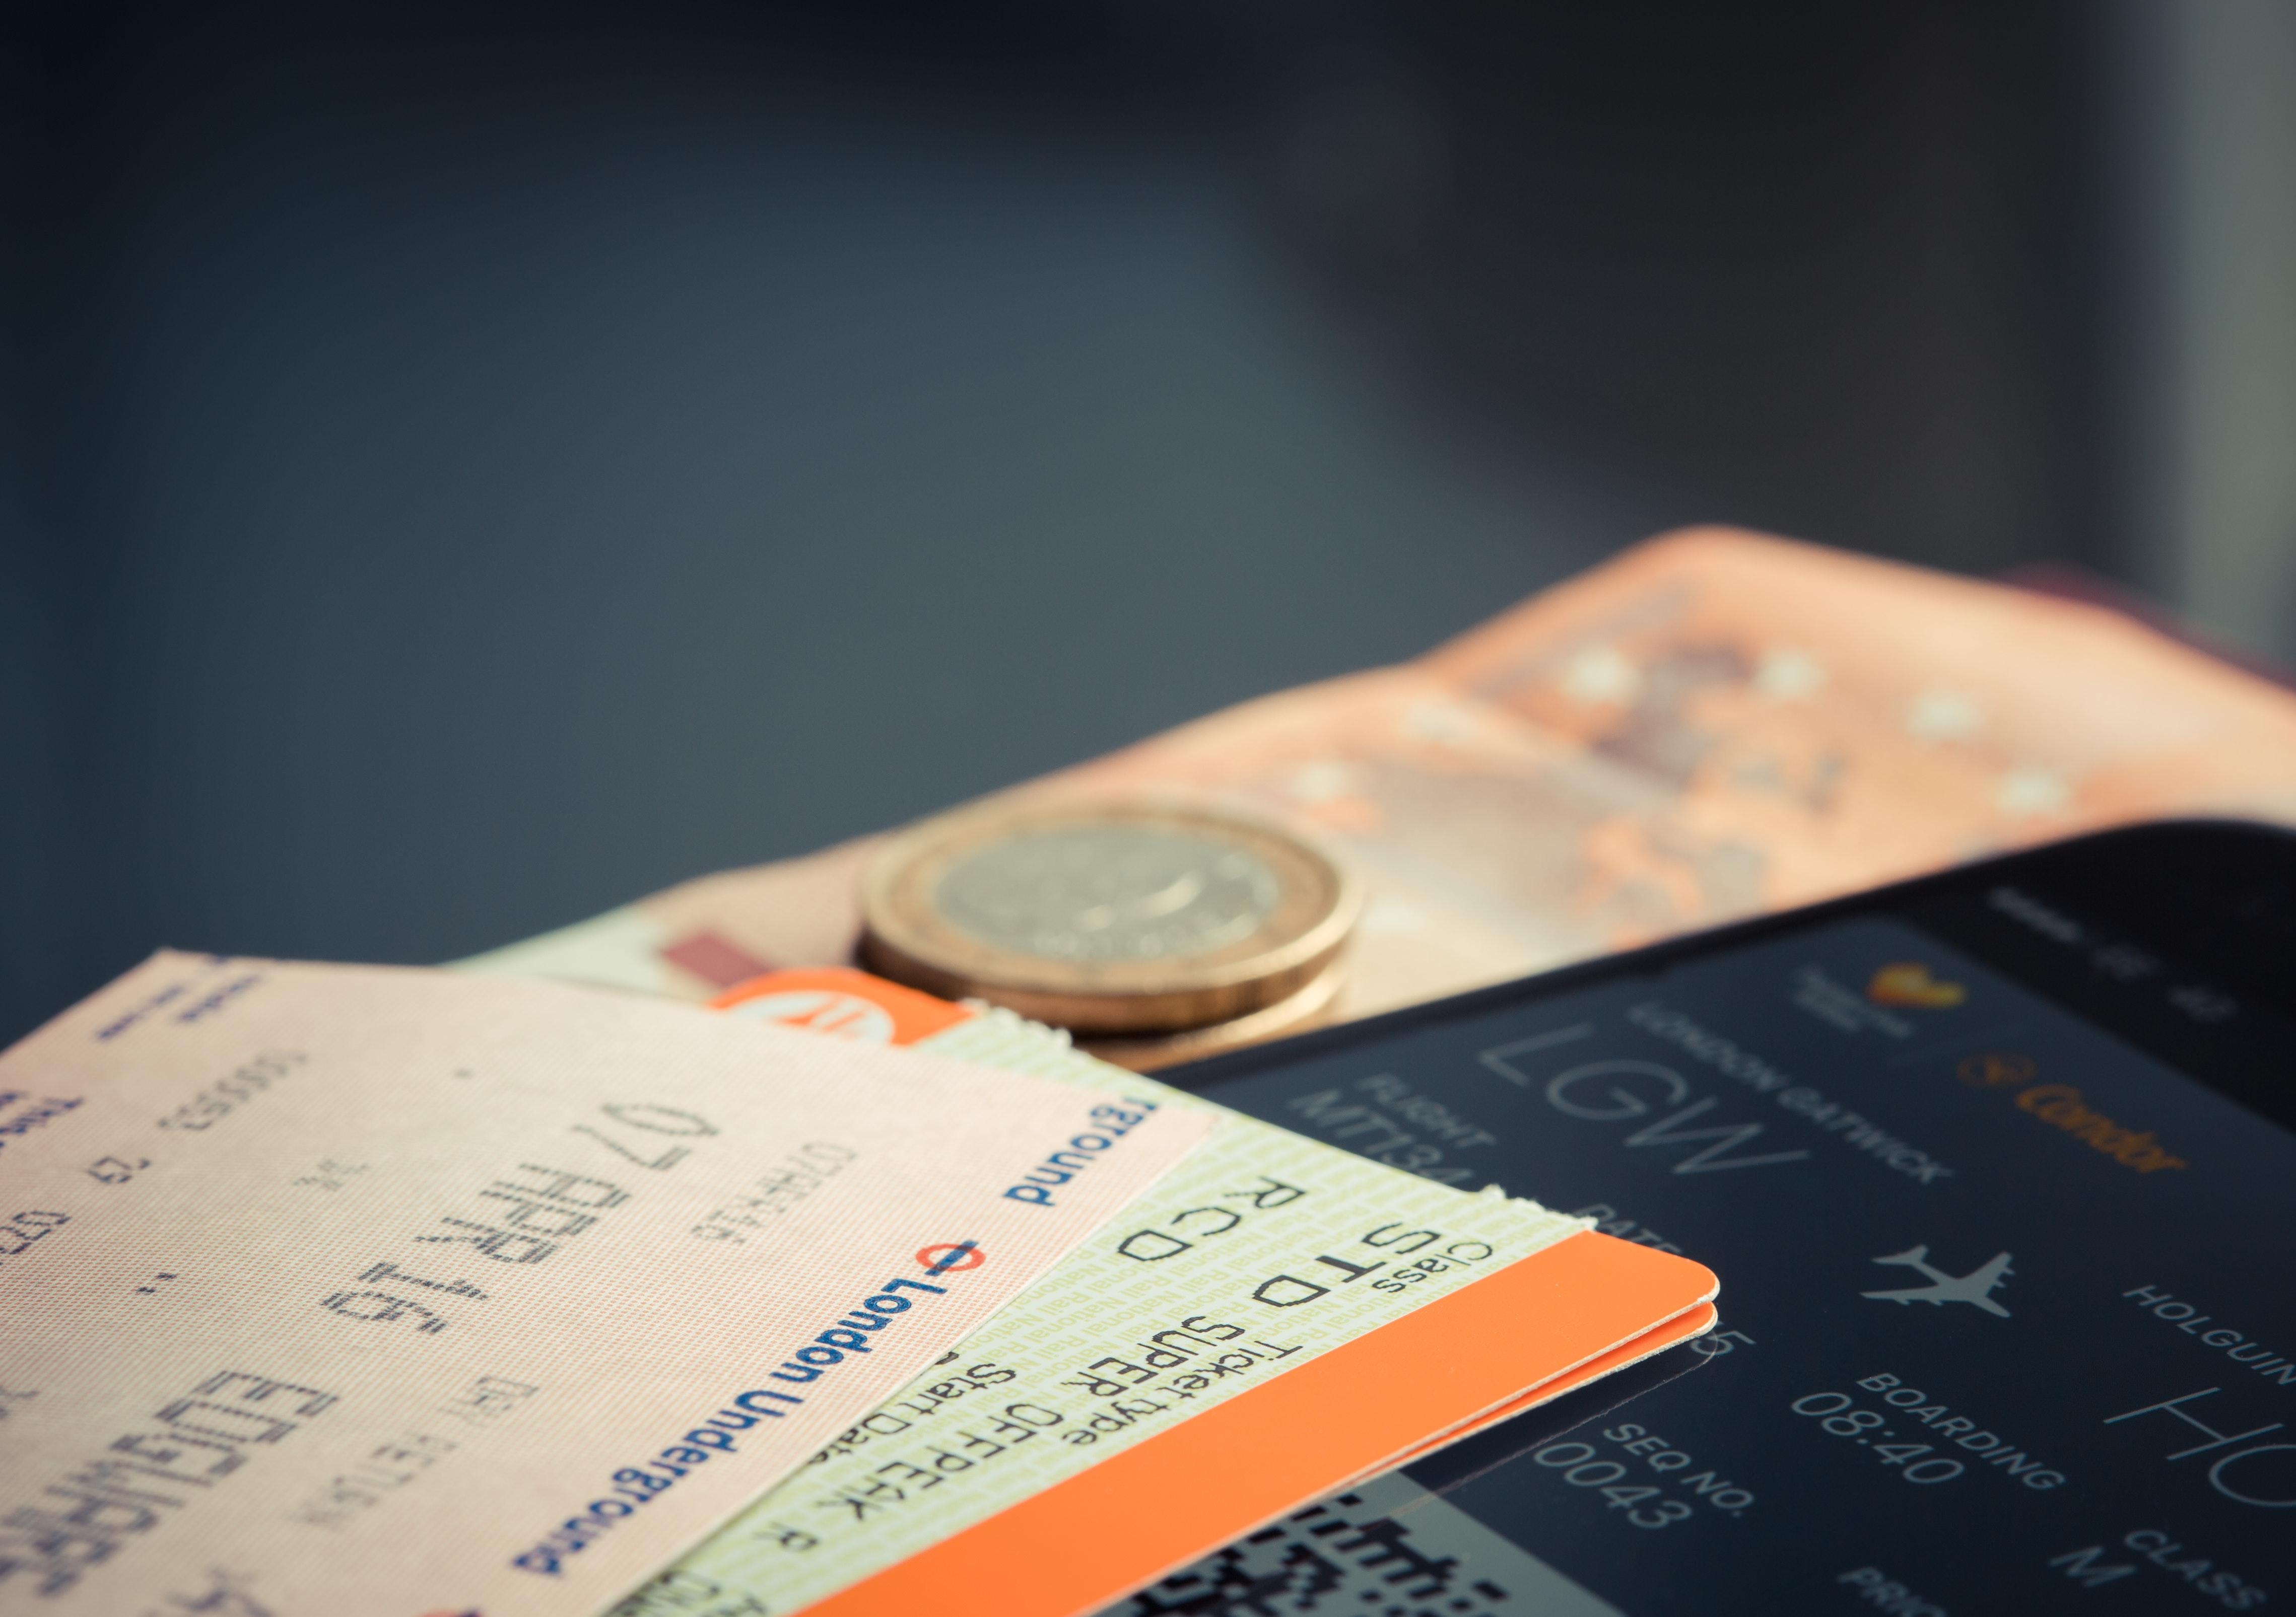 boarding-pass-euro-ticket-69866.jpg